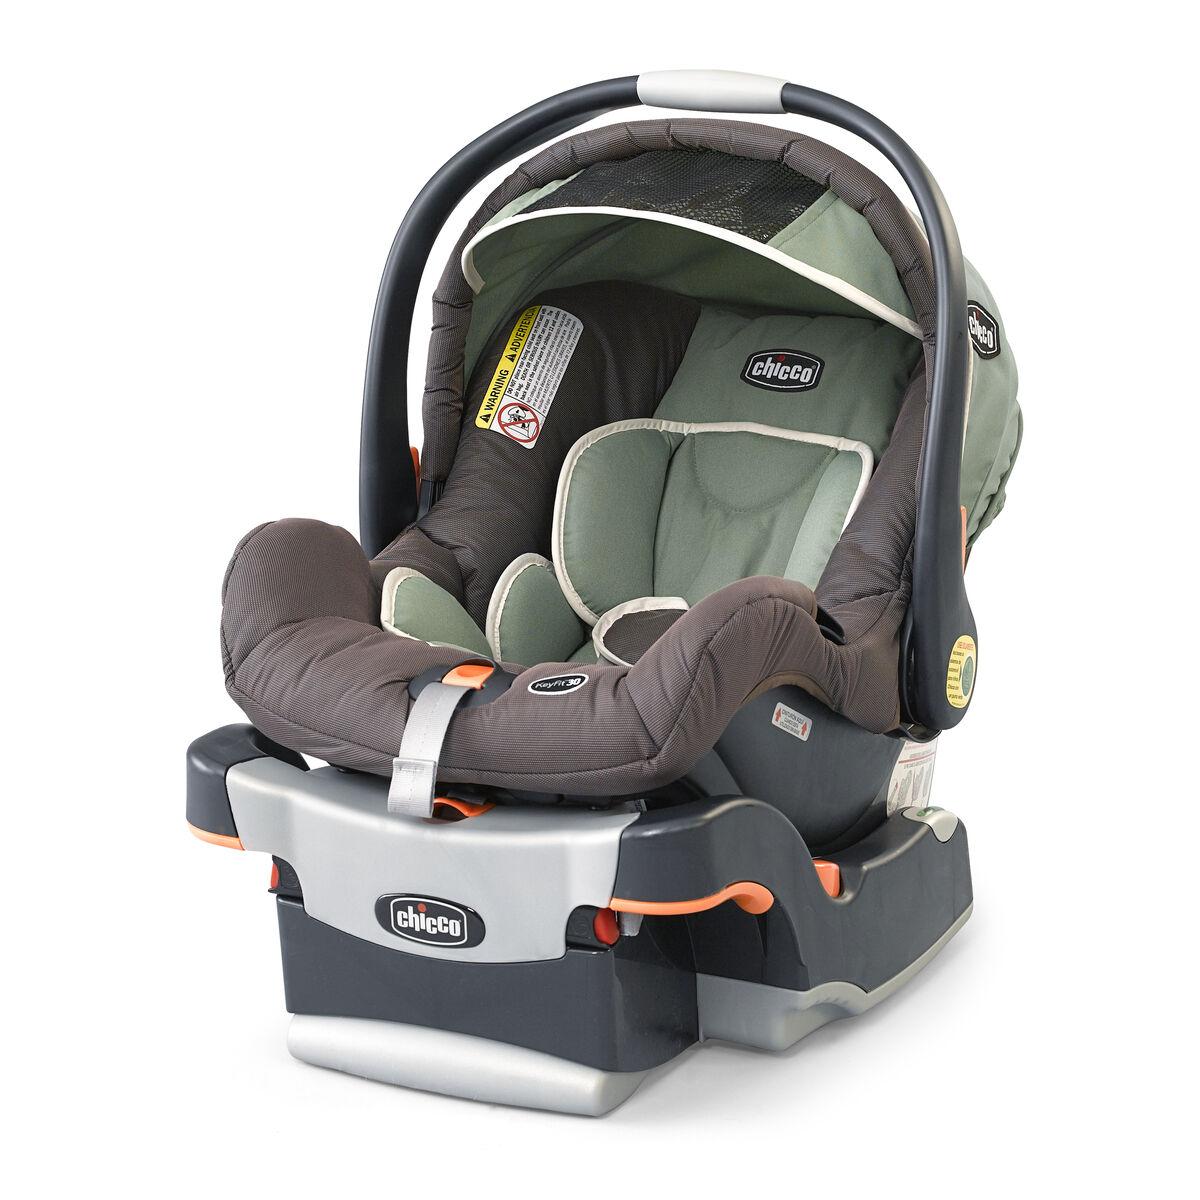 booster car seats baby target. Black Bedroom Furniture Sets. Home Design Ideas